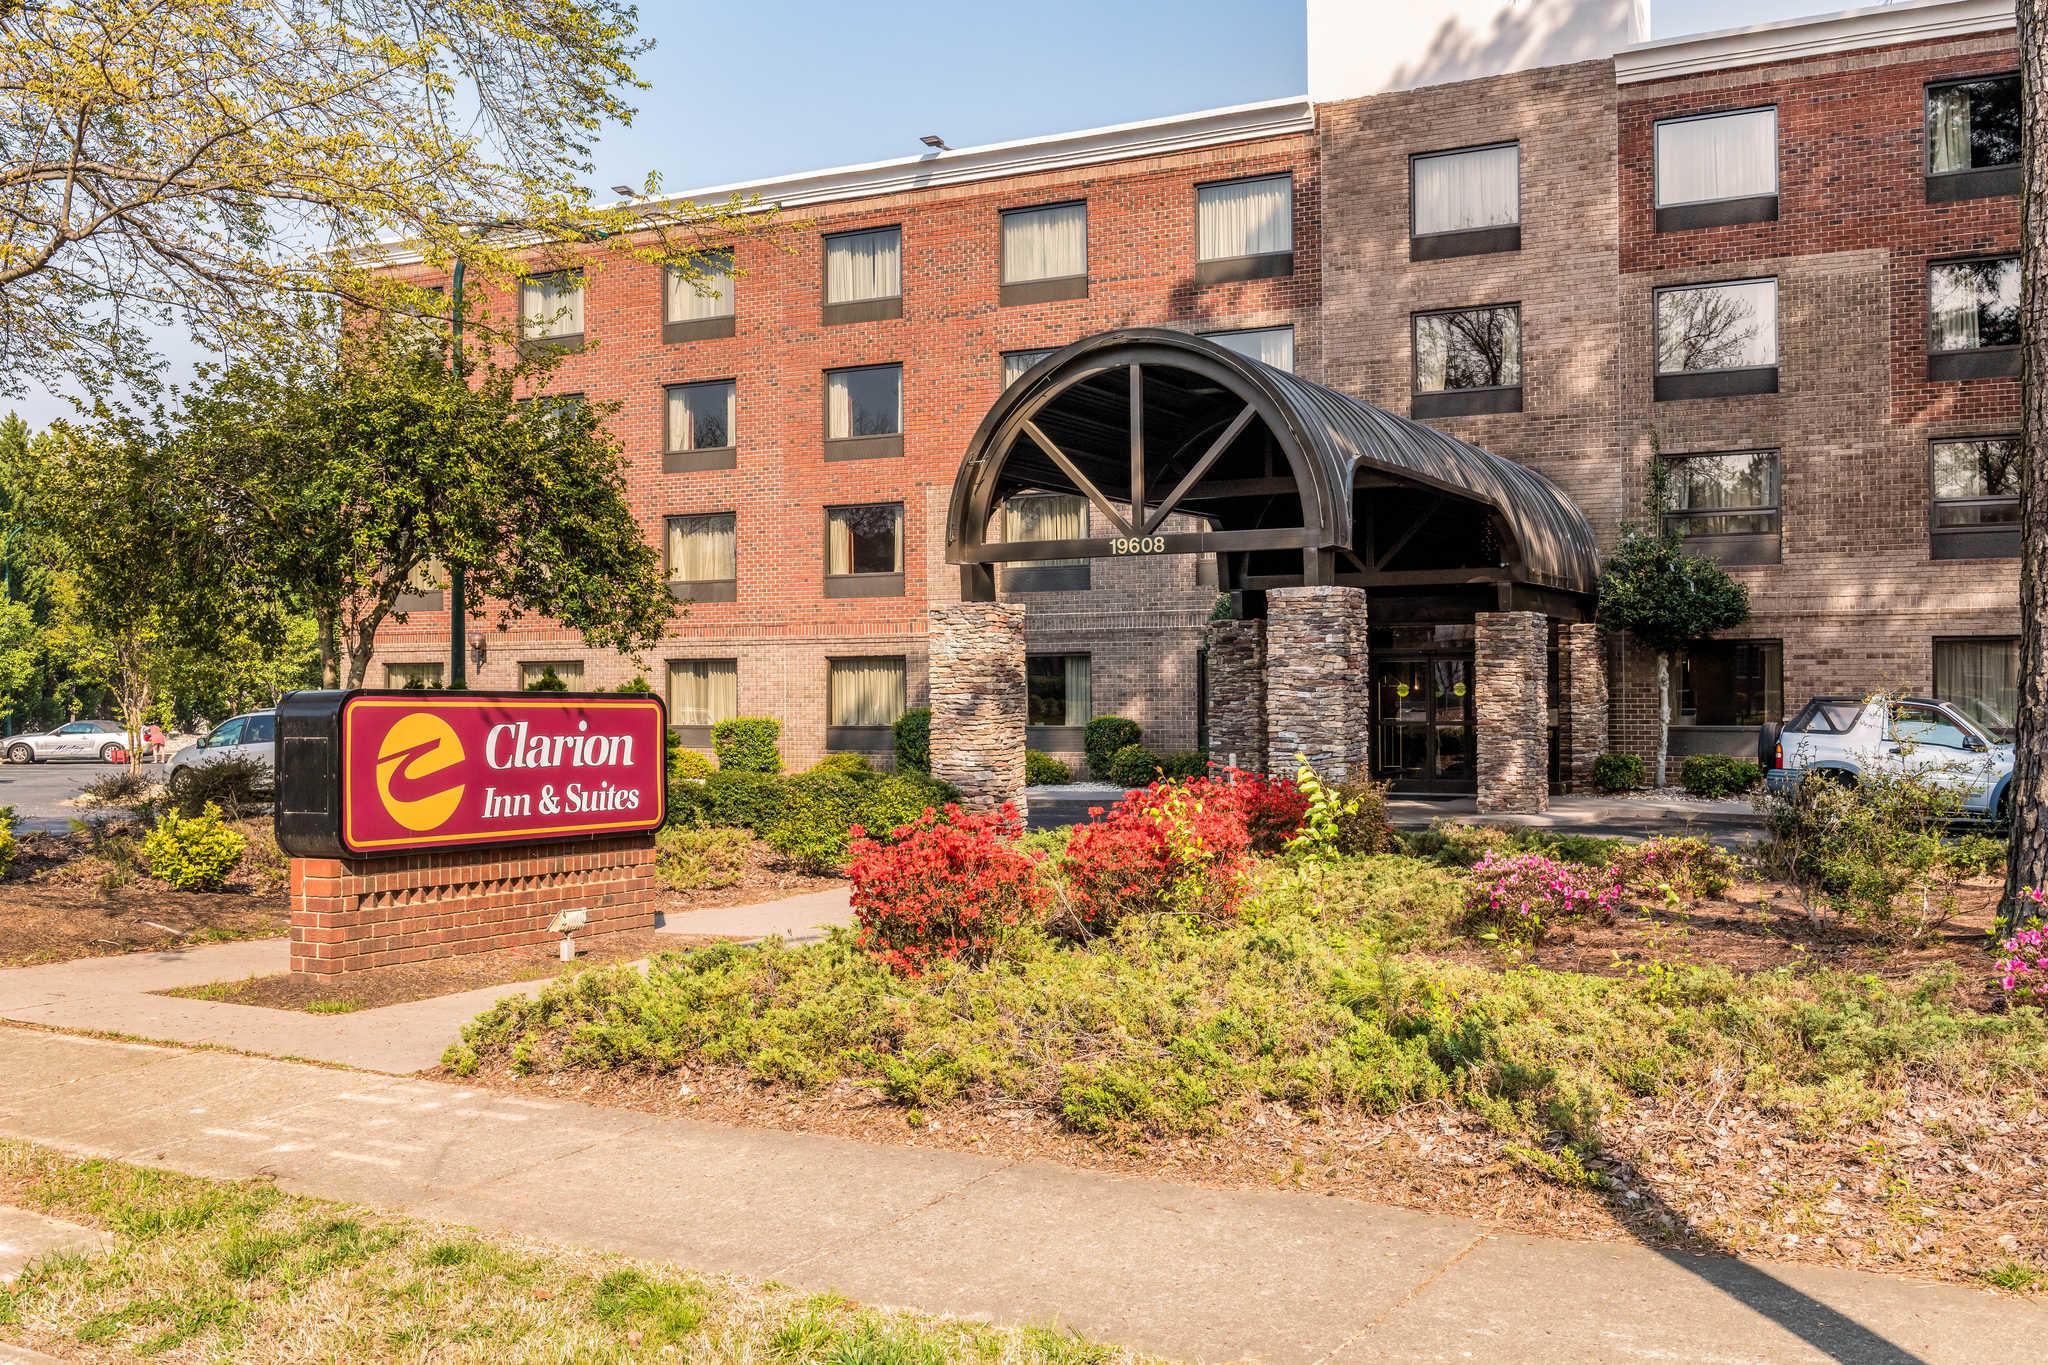 Clarion Inn & Suites image 0